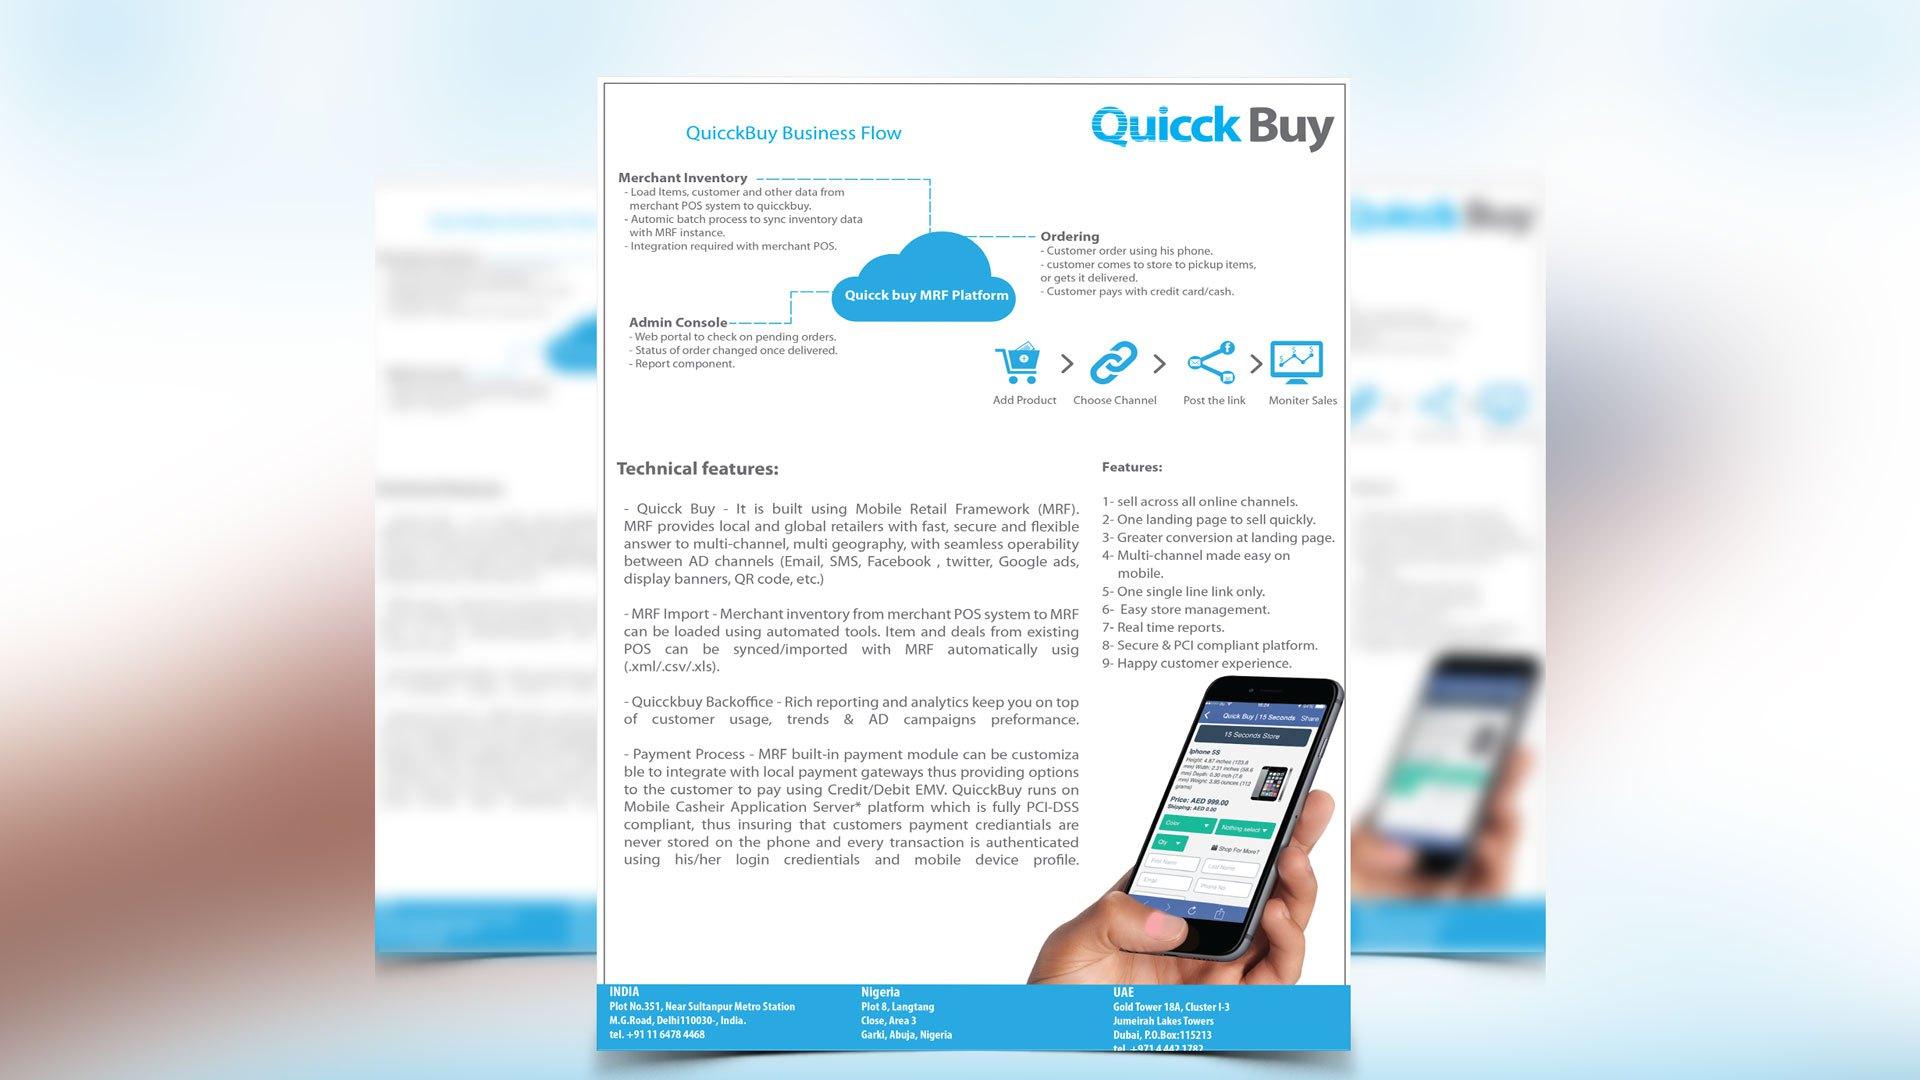 Quicckbuy-flyer-design-1